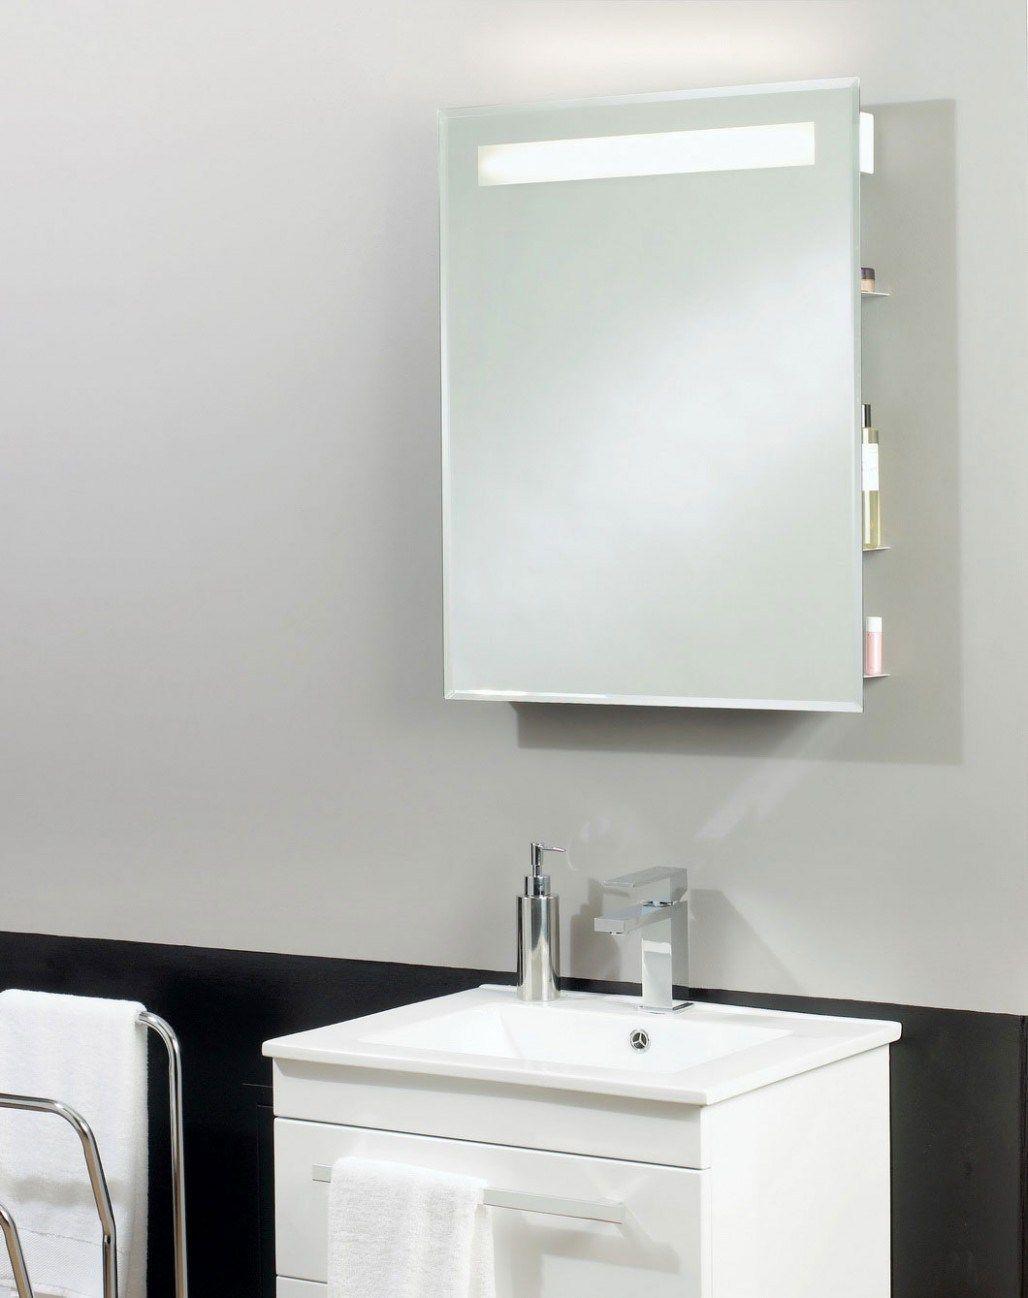 pin by wall home on wallpaperhome bathroom mirror design bathroom rh pinterest com